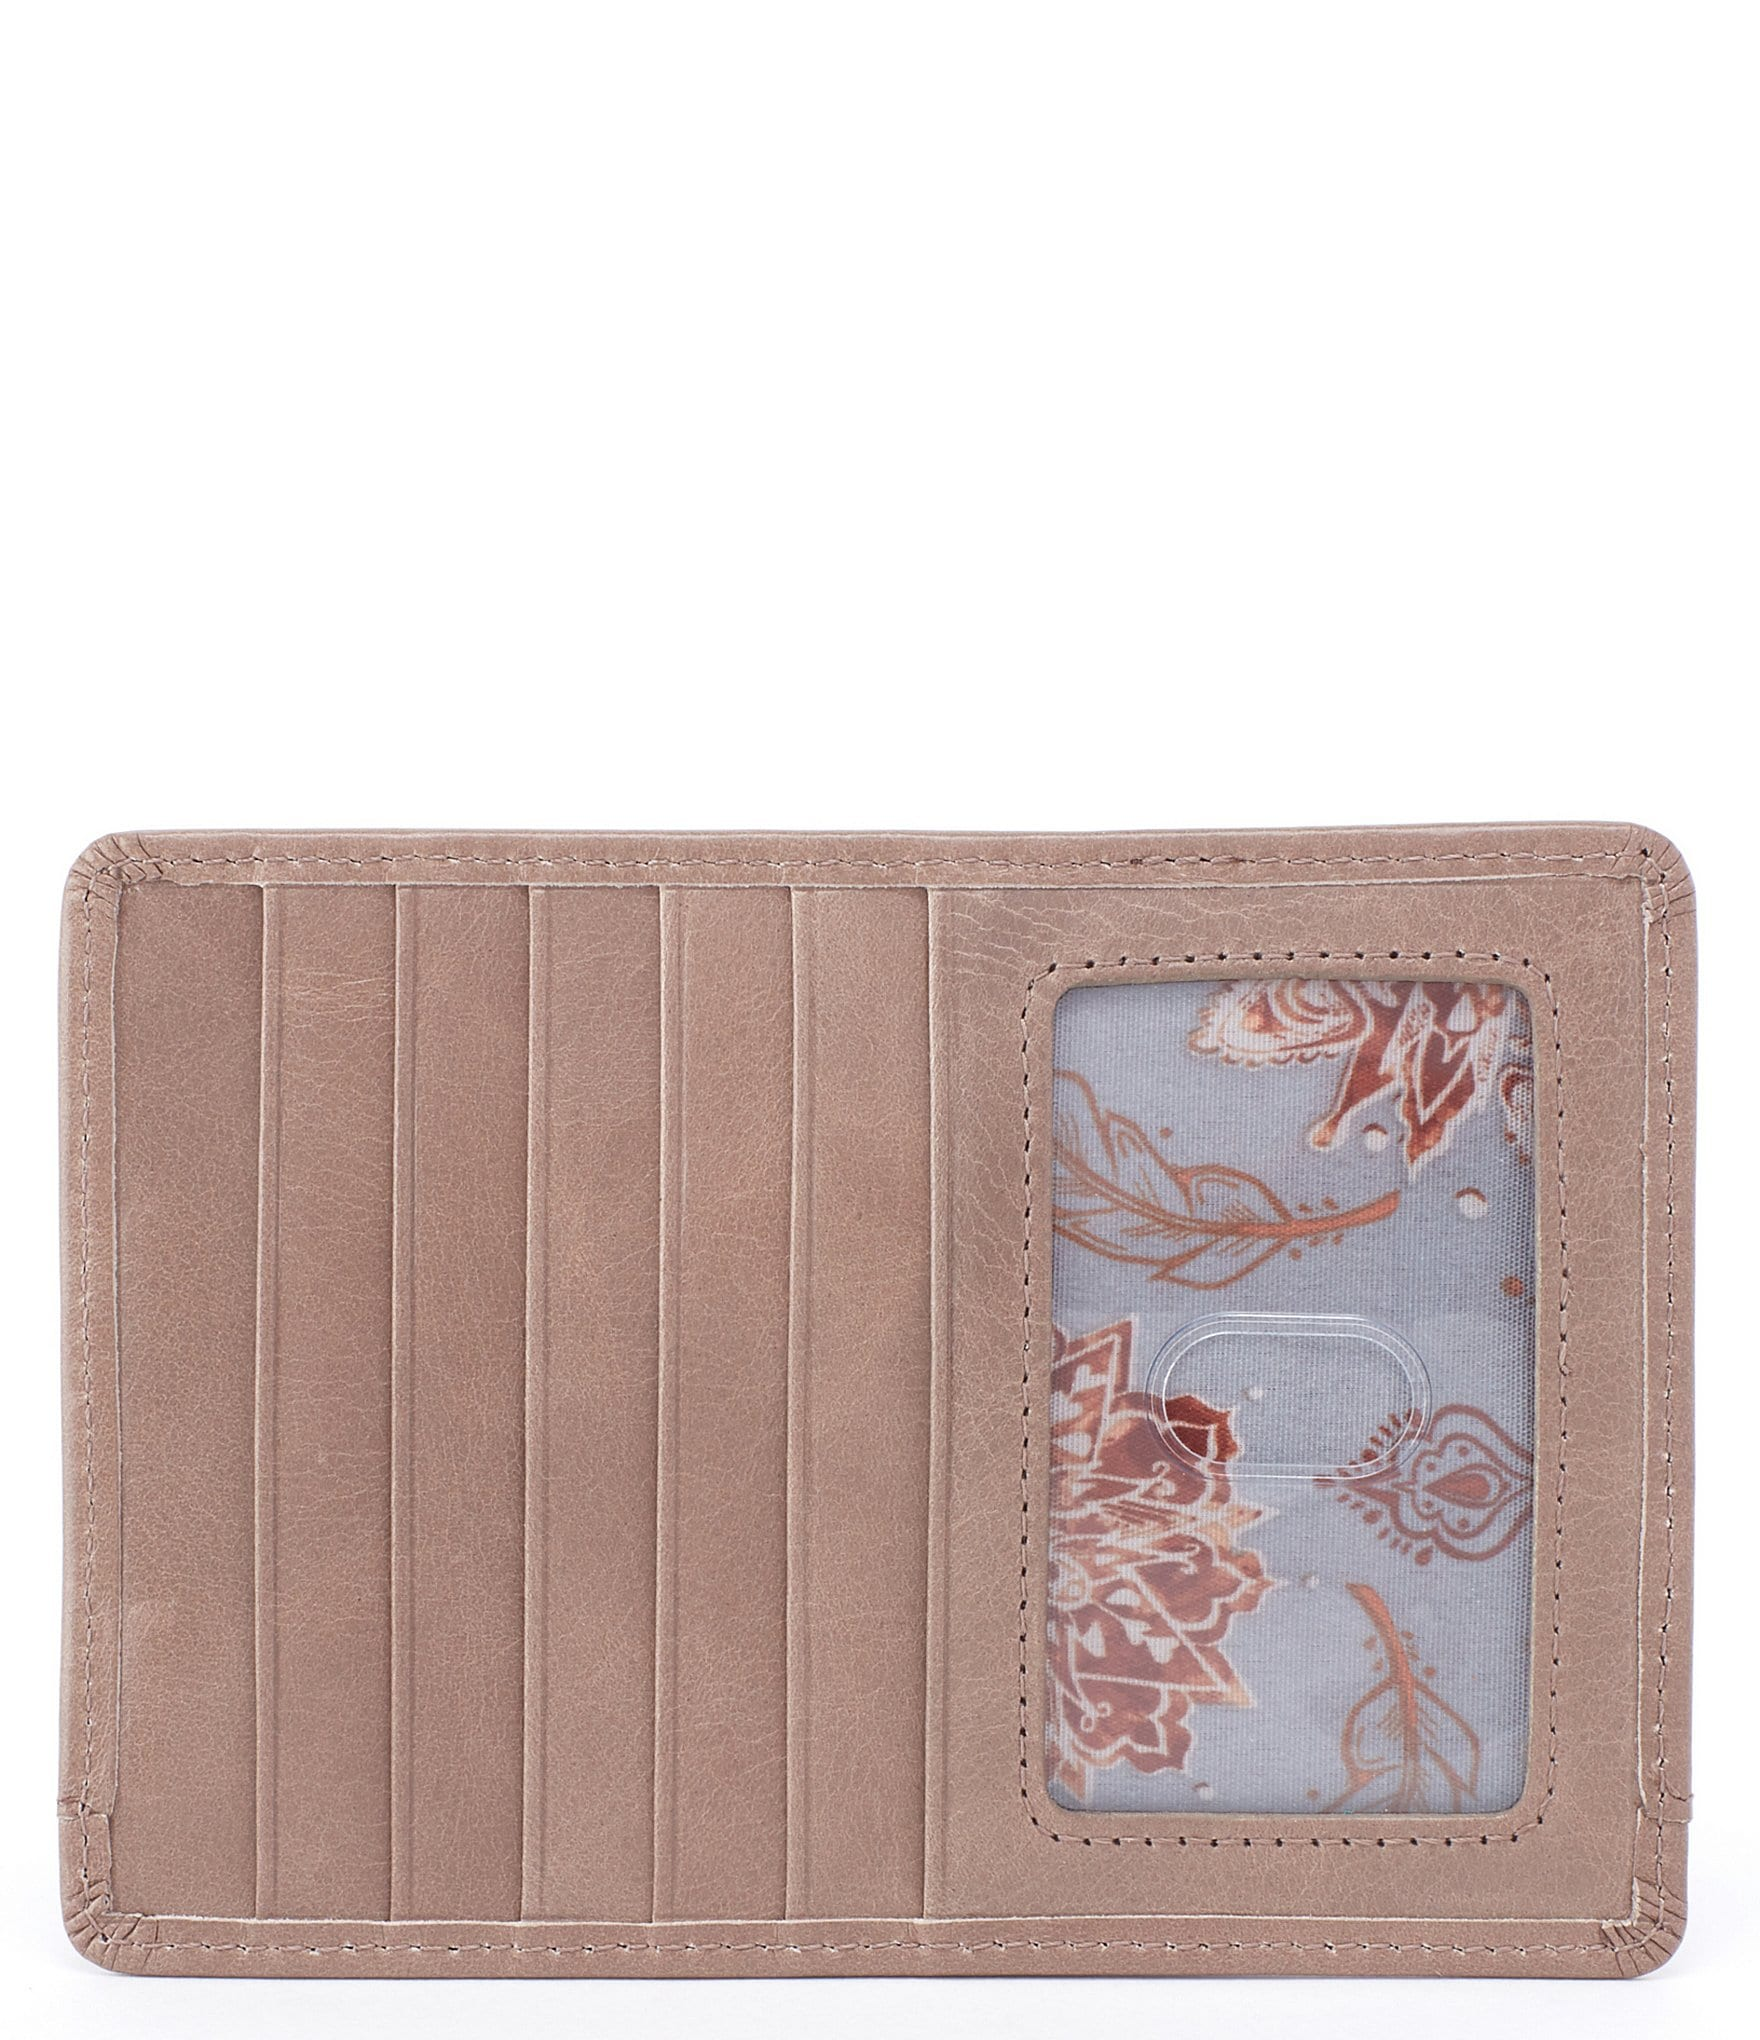 Leather Passport Case - SURVIVOR RIBBON PASSPORT by VIDA VIDA AITvg0TpQf